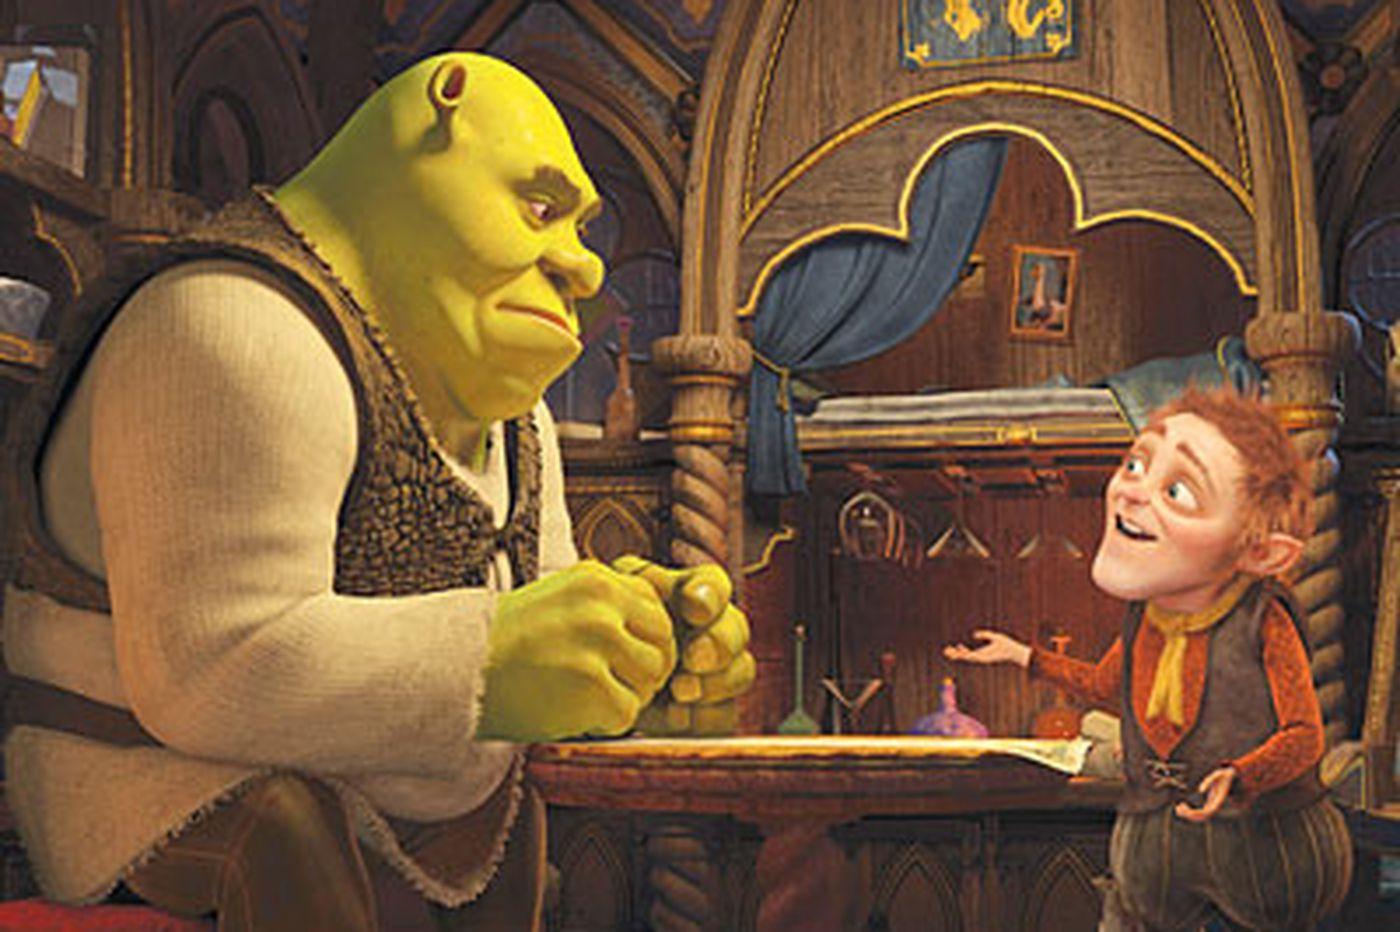 Gloomy Shrek is feeling like a sellout in sequel No. 4